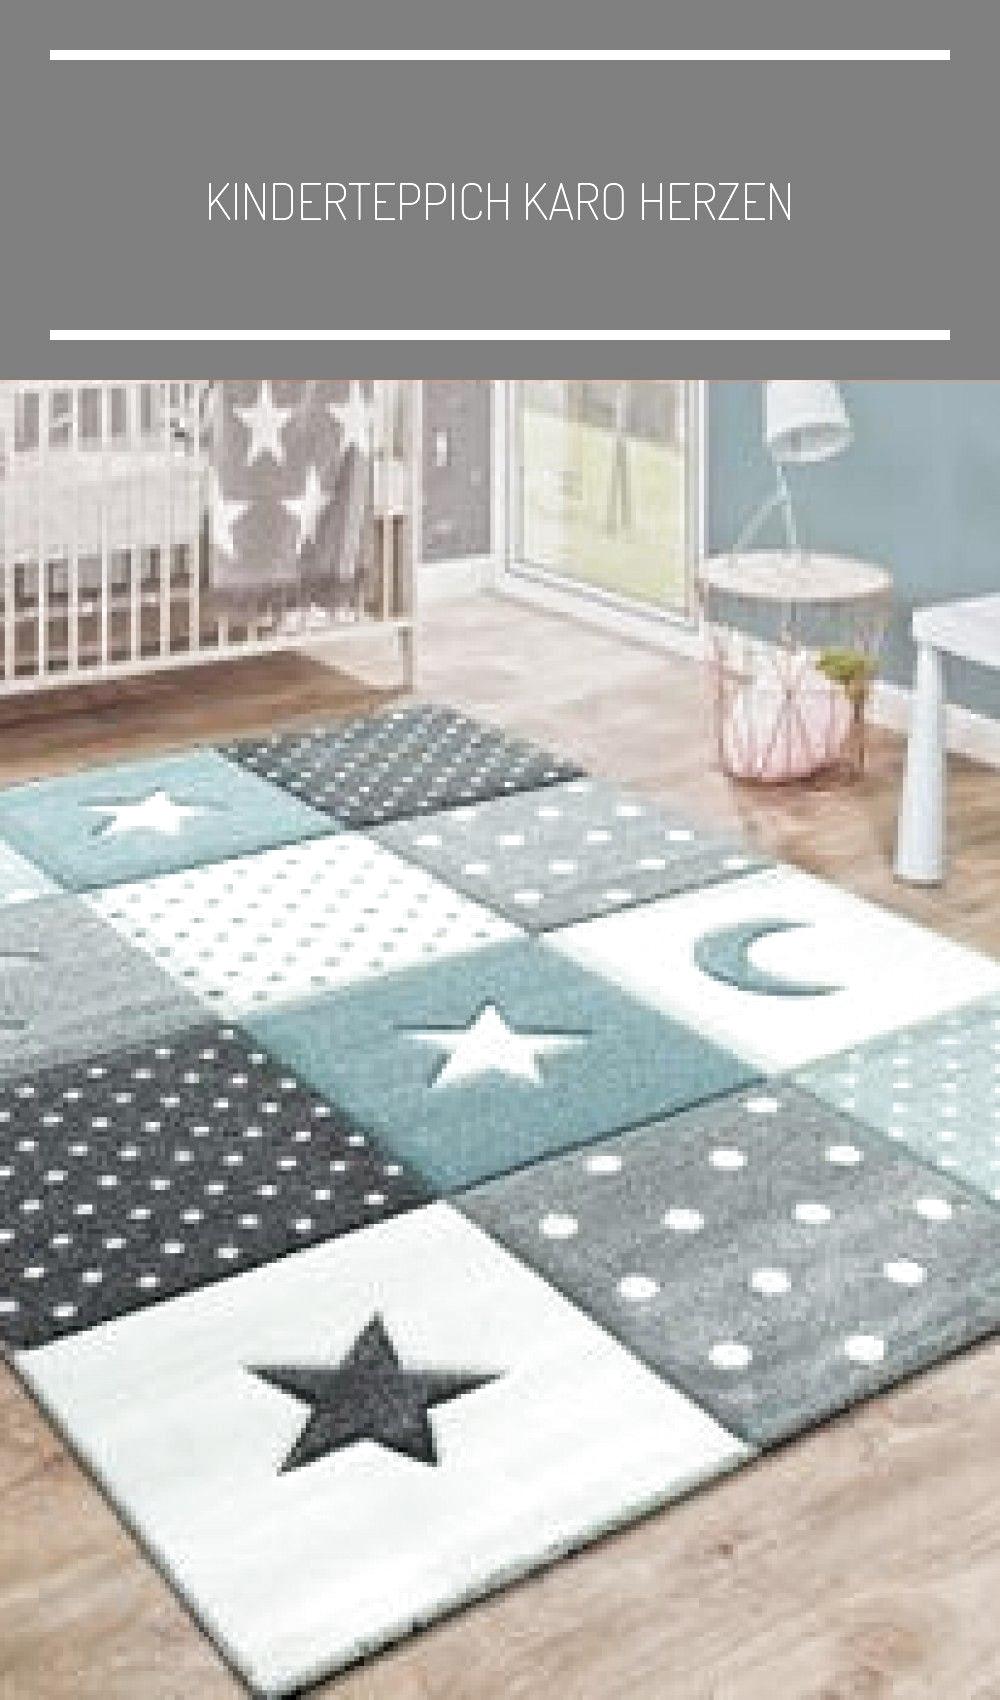 Kinderteppich Karo Herzen Sterne Blau Grau #babyzimmer wandgestaltung grau Kinde...